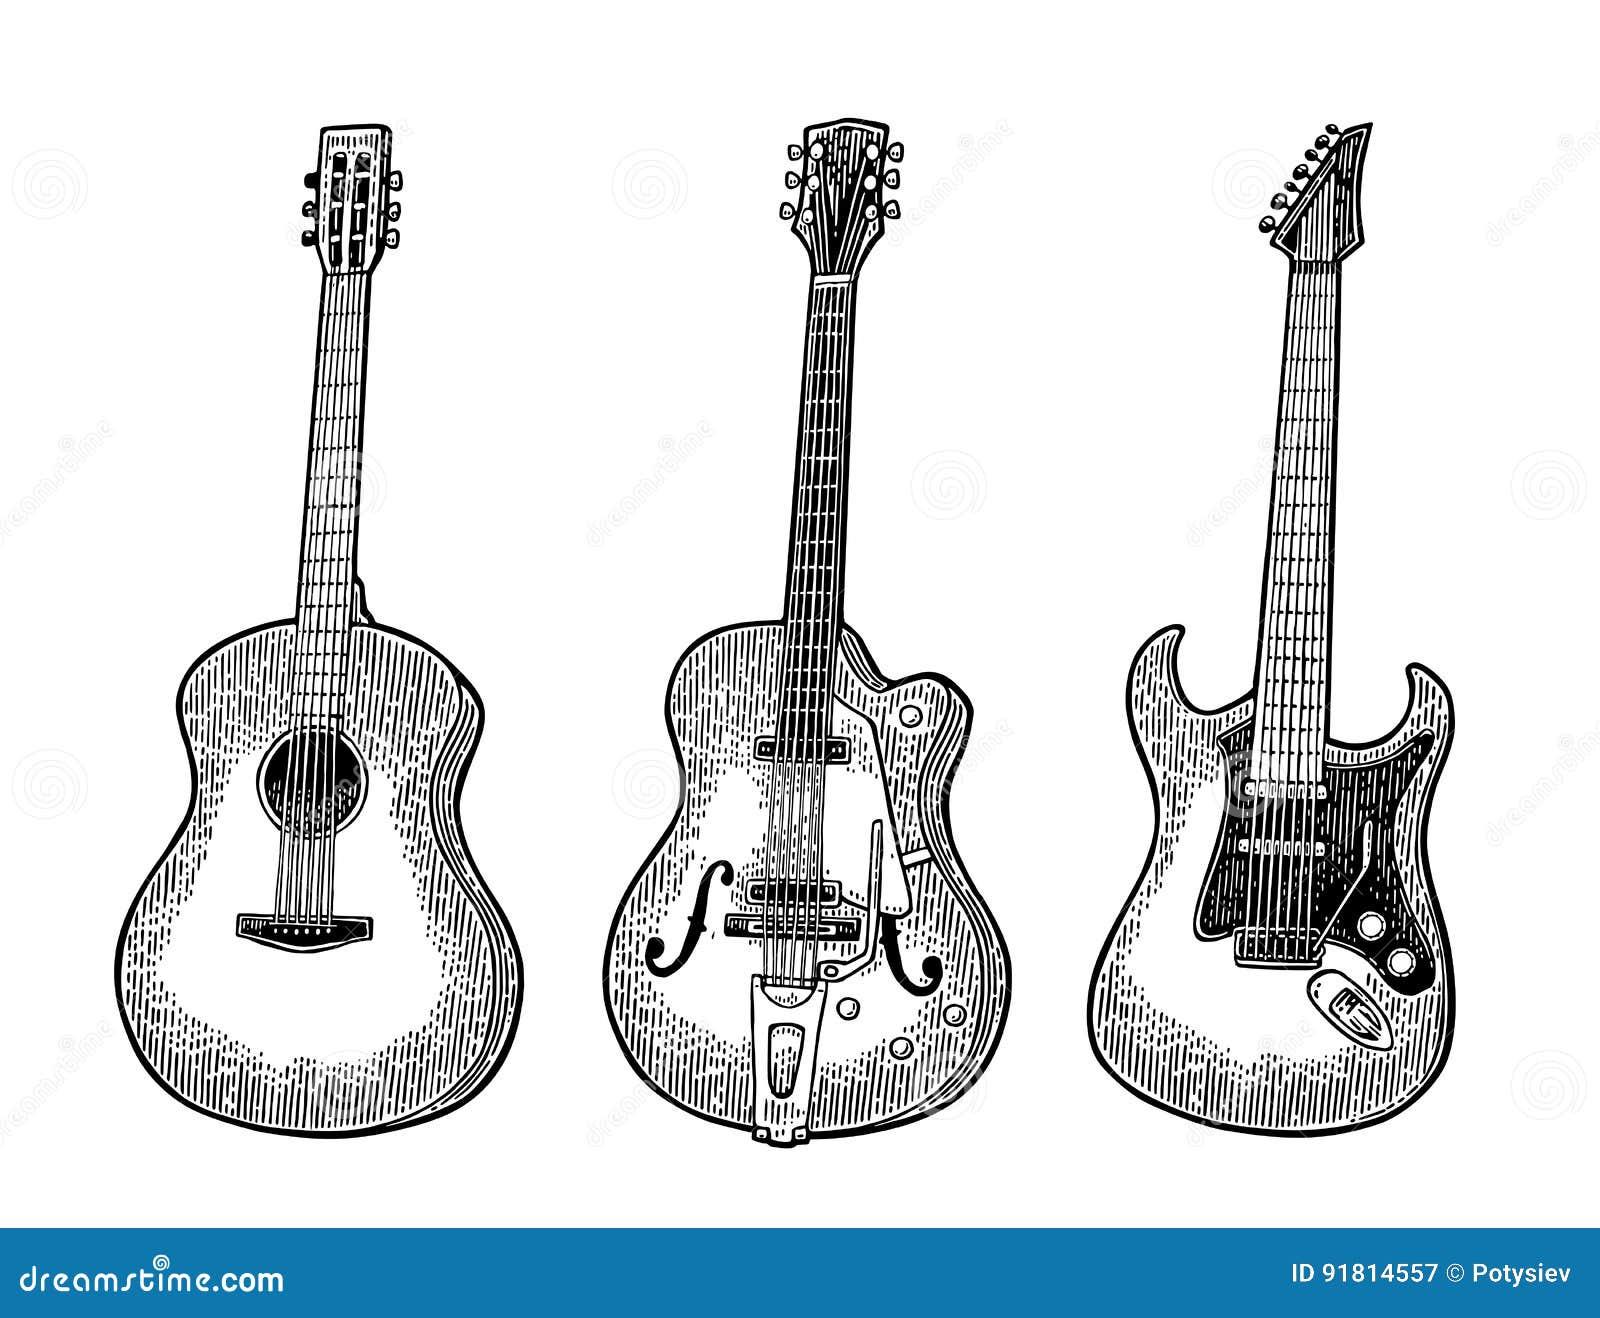 instrument cartoons  illustrations  u0026 vector stock images